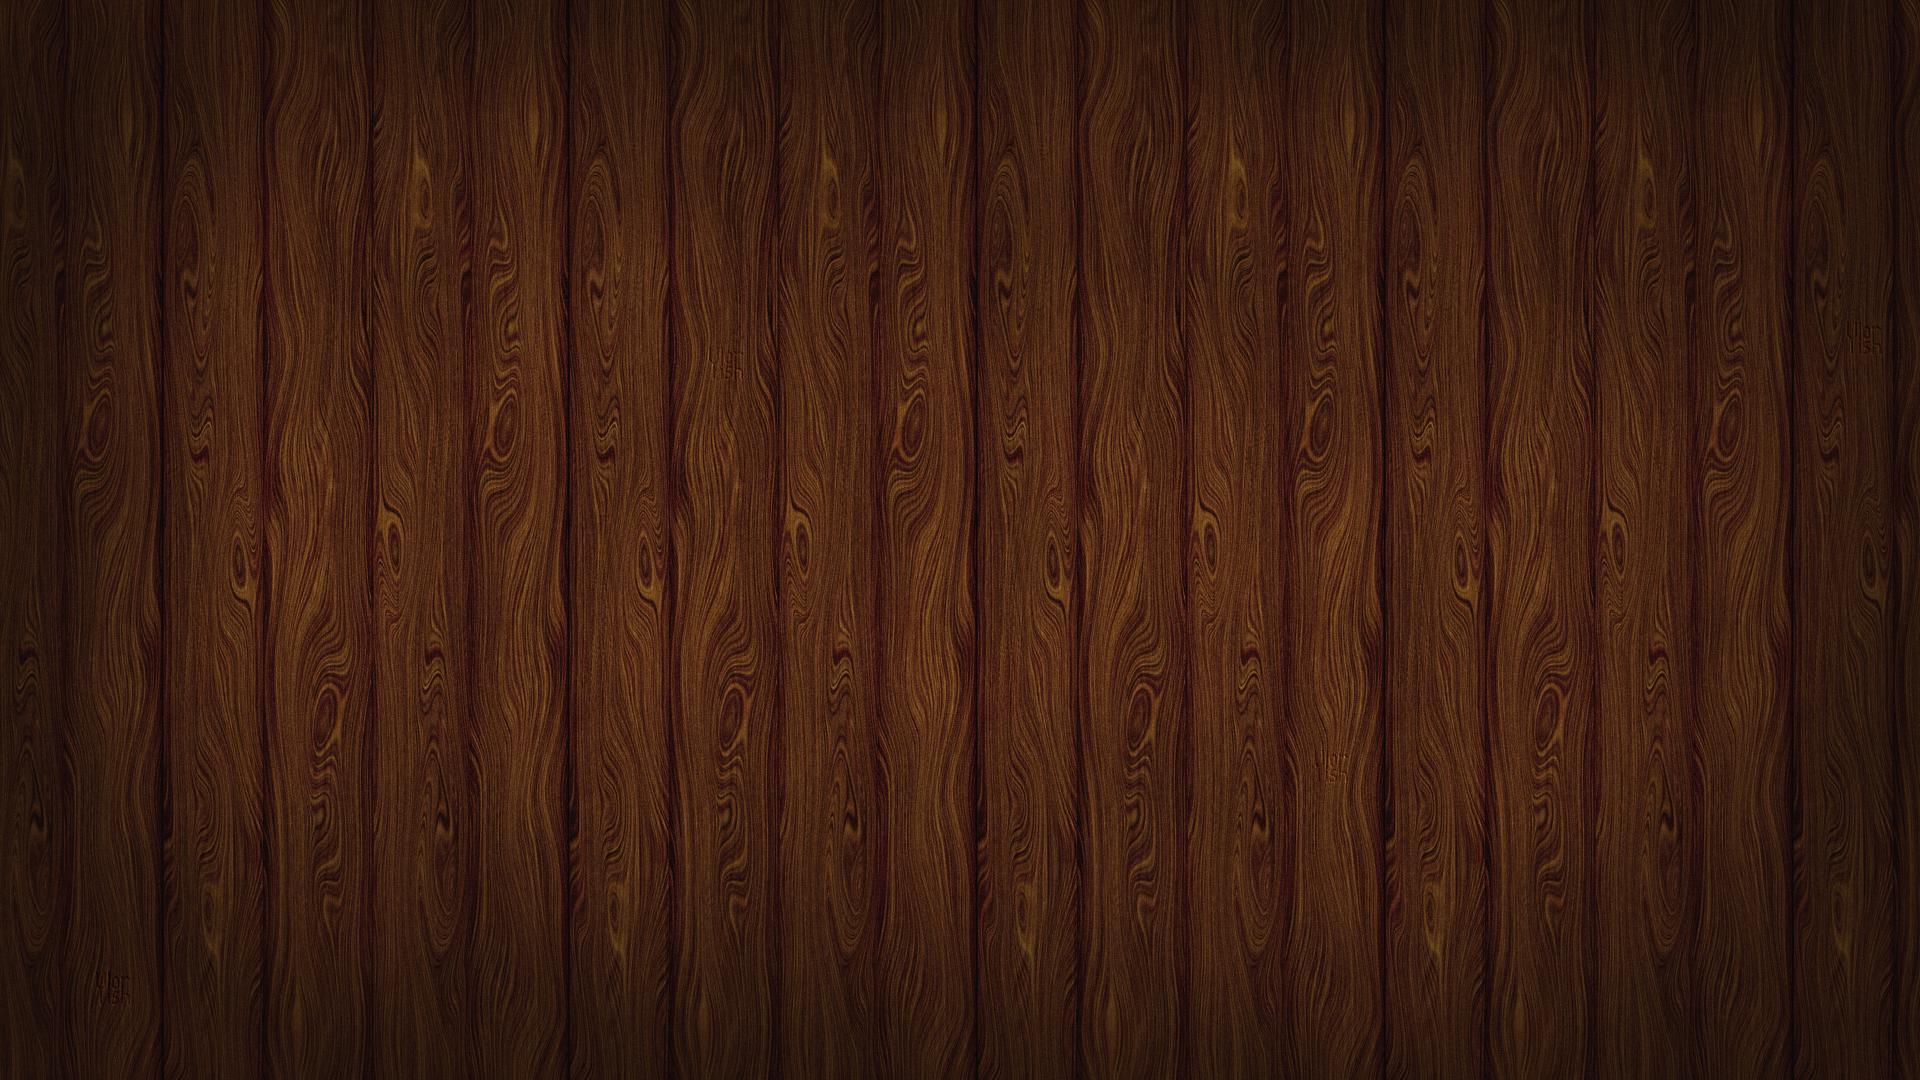 Wooden wallpaper for Wooden wallpaper price